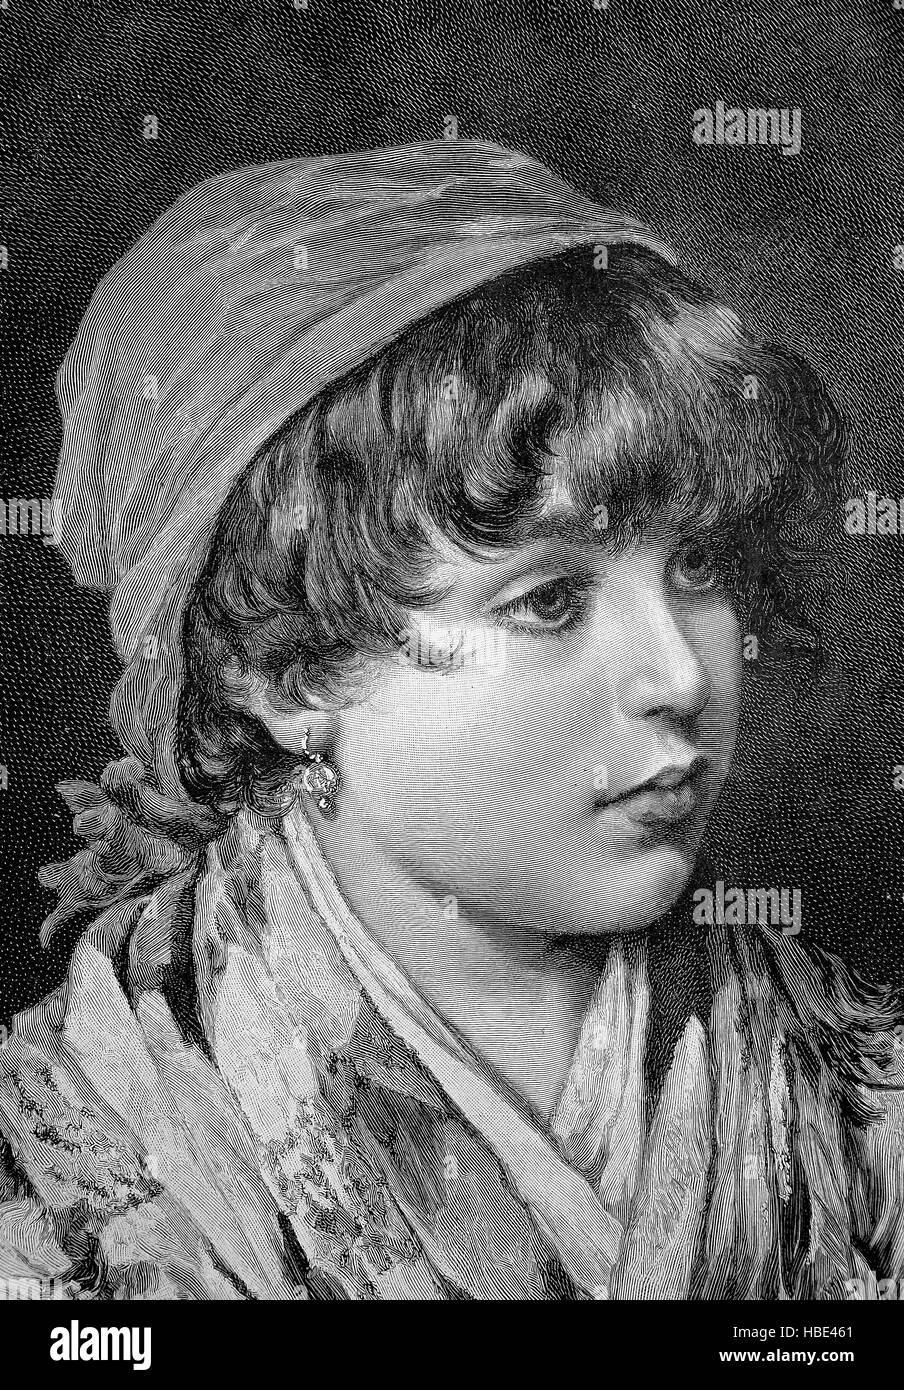 Portrait of a Venetian fisherman girl, Venezia, Italy, illustration, woodcut from 1880 - Stock Image